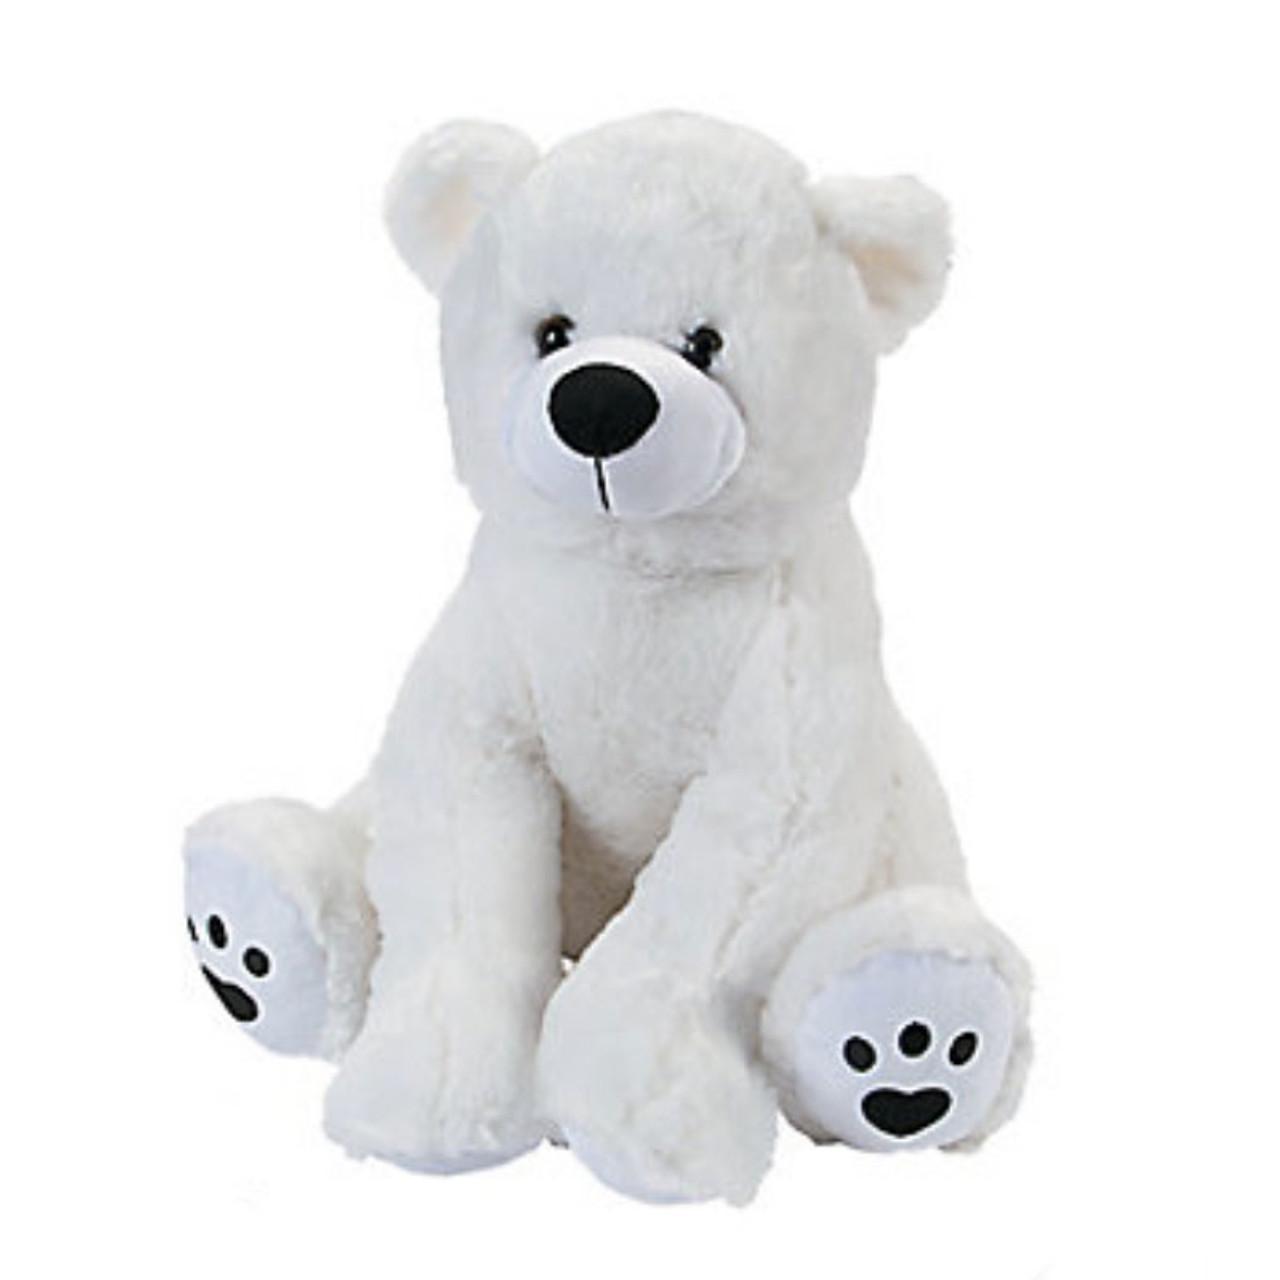 Soft White Polar Bear Stuffed Animal A Soft Favorite